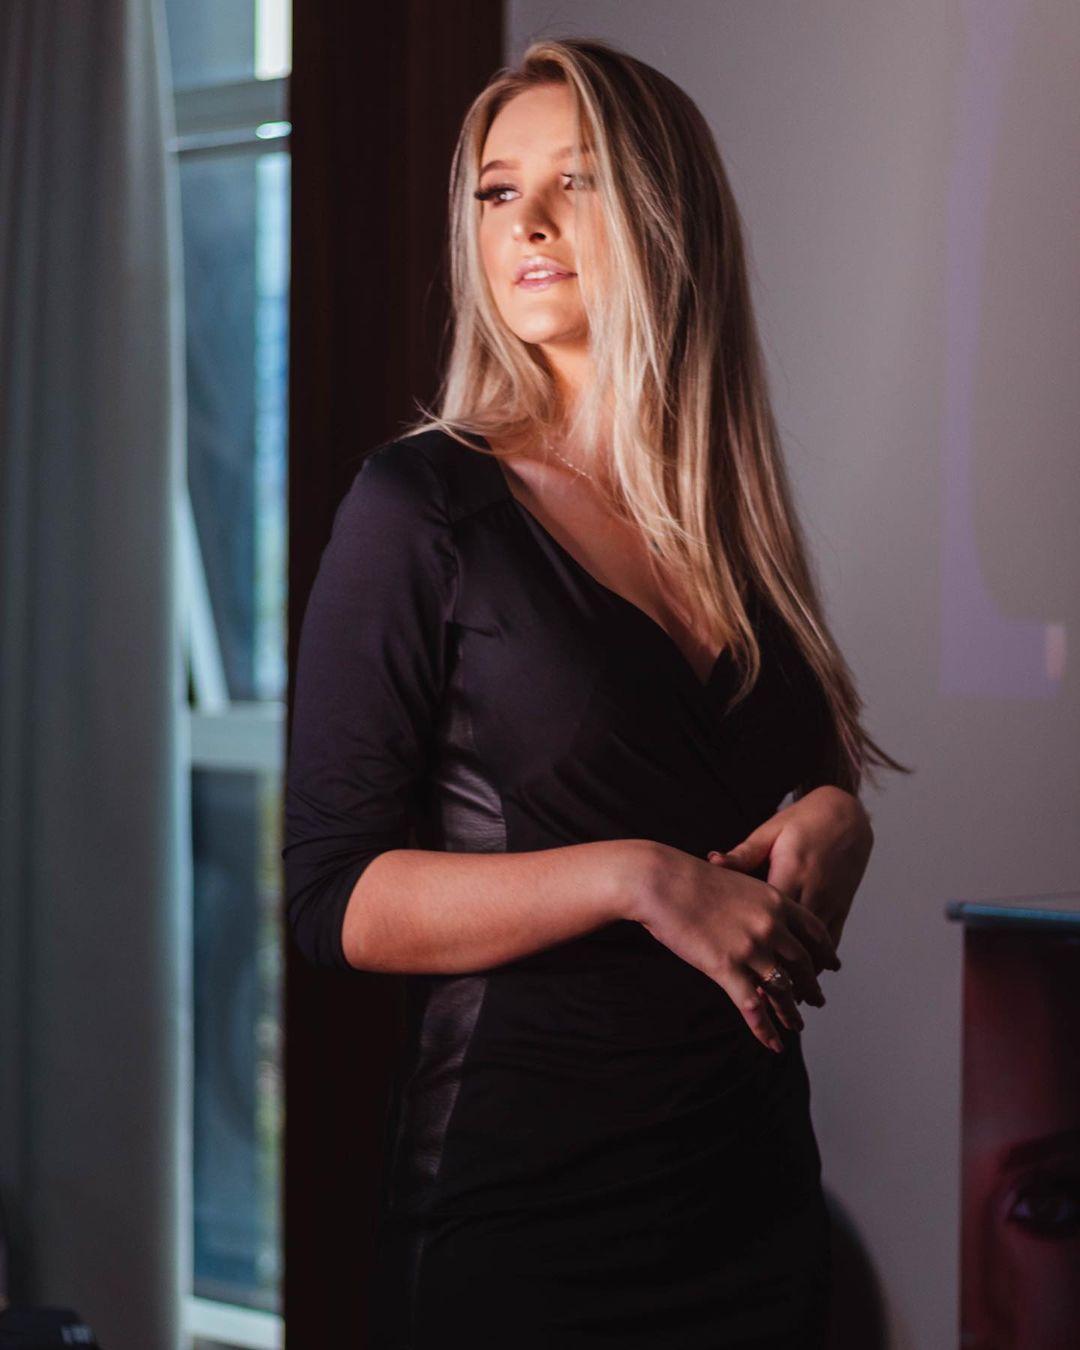 larissa neiverth, top 20 de miss brasil mundo 2019. - Página 3 Qket5p10